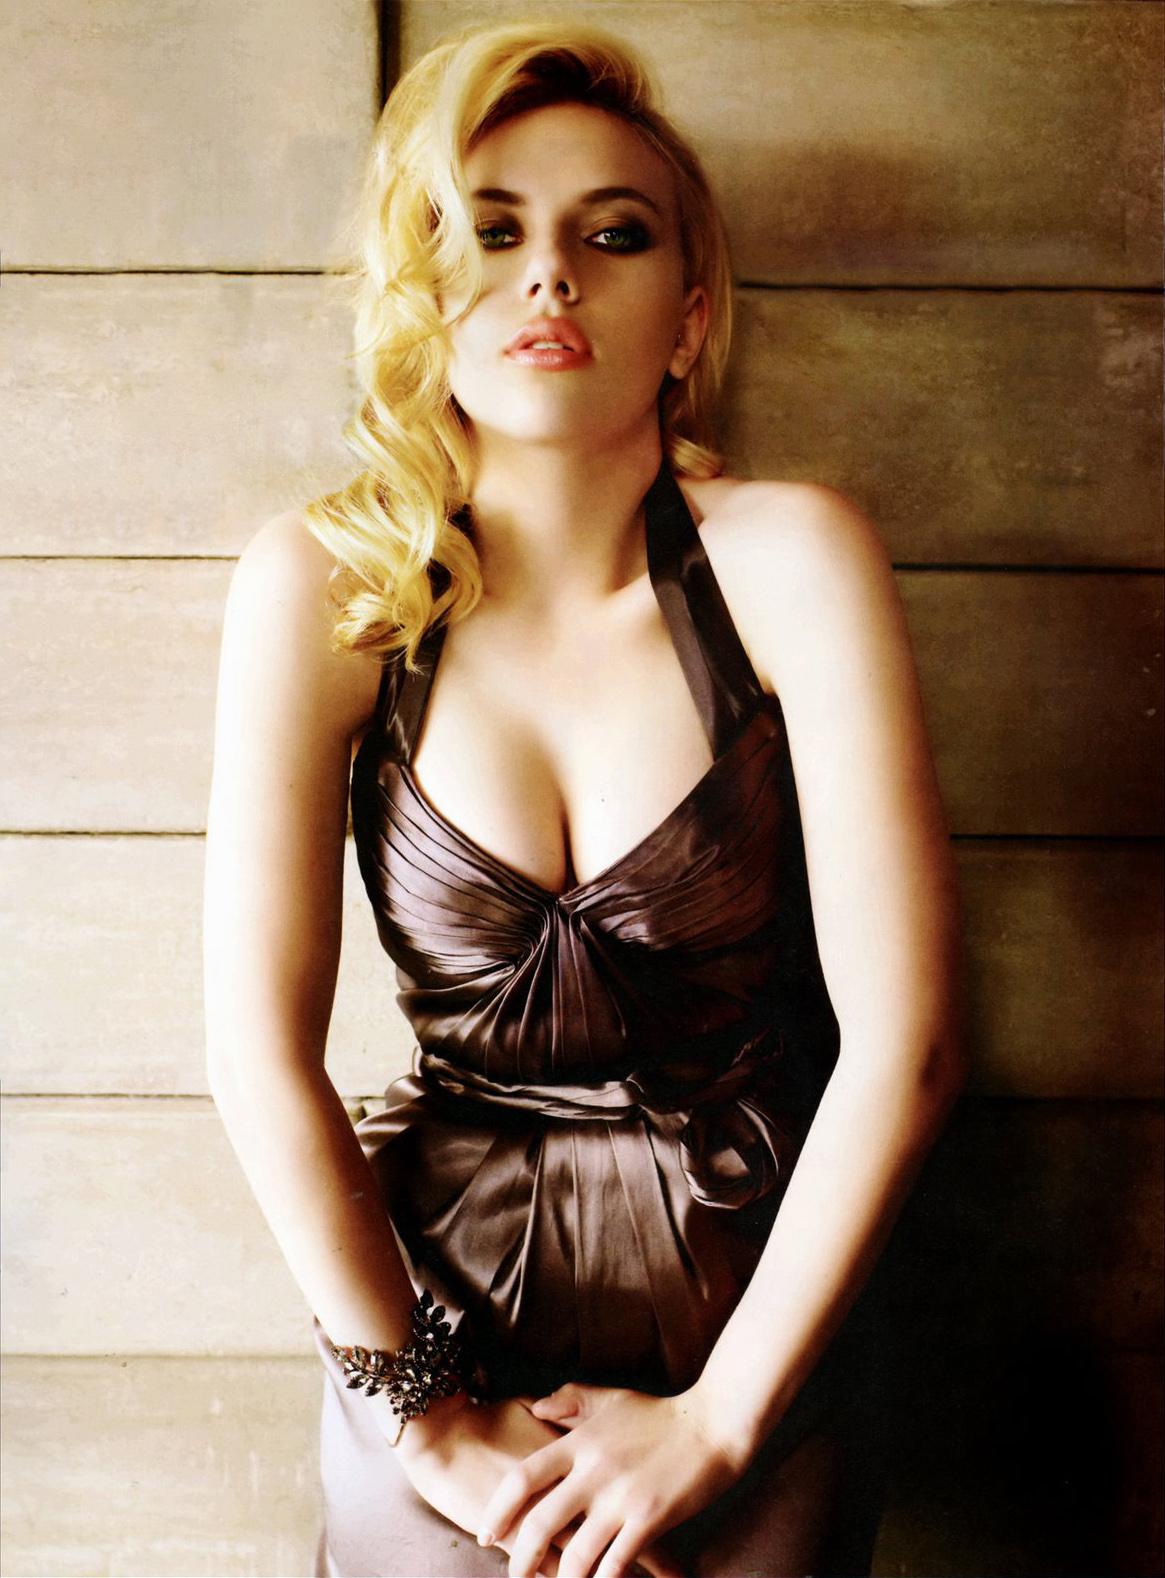 Avengers Scarlett Johansson Wallpapers HD Wallpapers